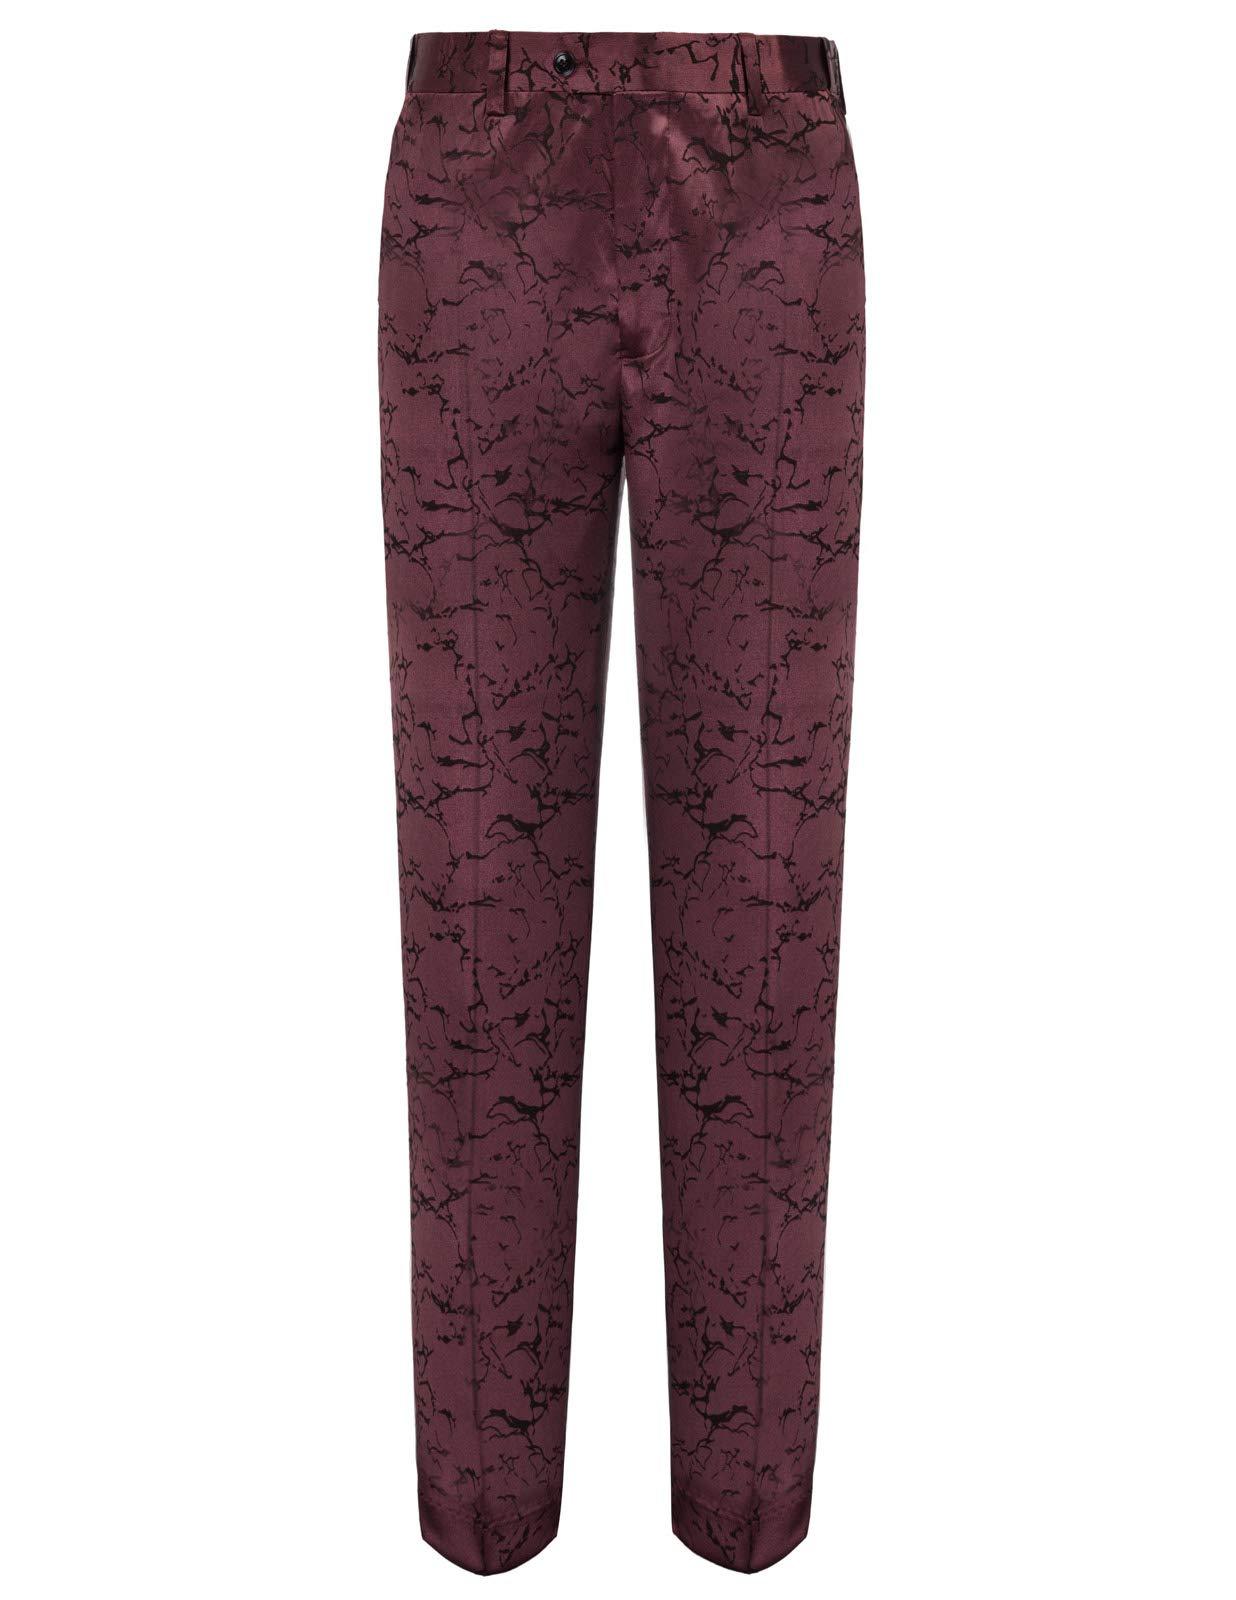 Men's Floral Suit Stylish Straight Pant Adjustable Waist M Dark Wine by PAUL JONES